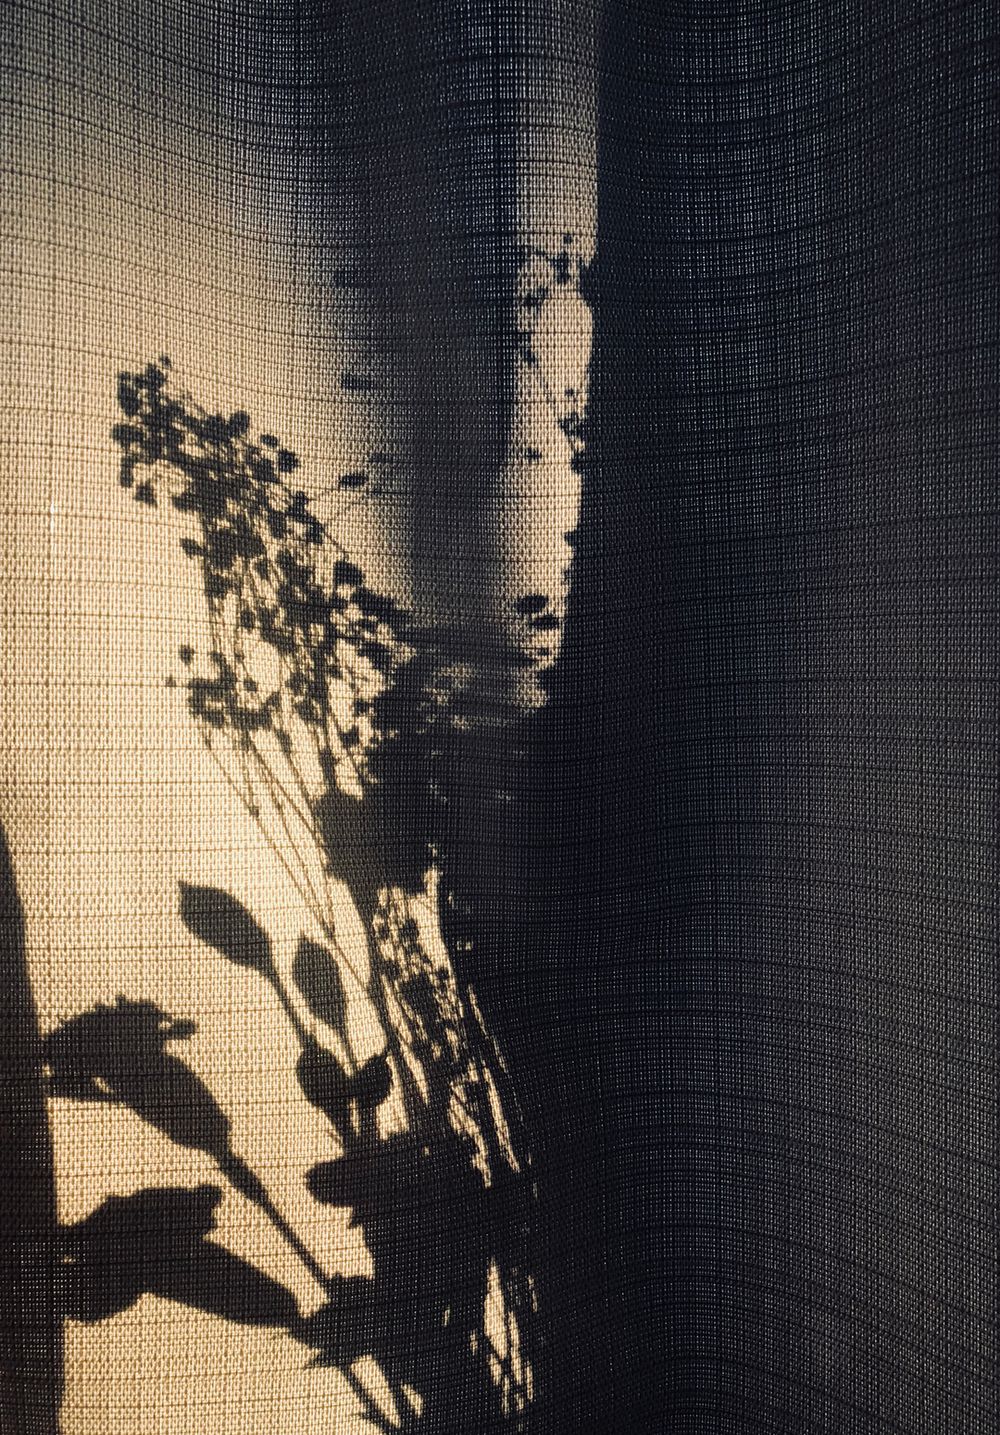 desert-design-days-shadows-fabric.png